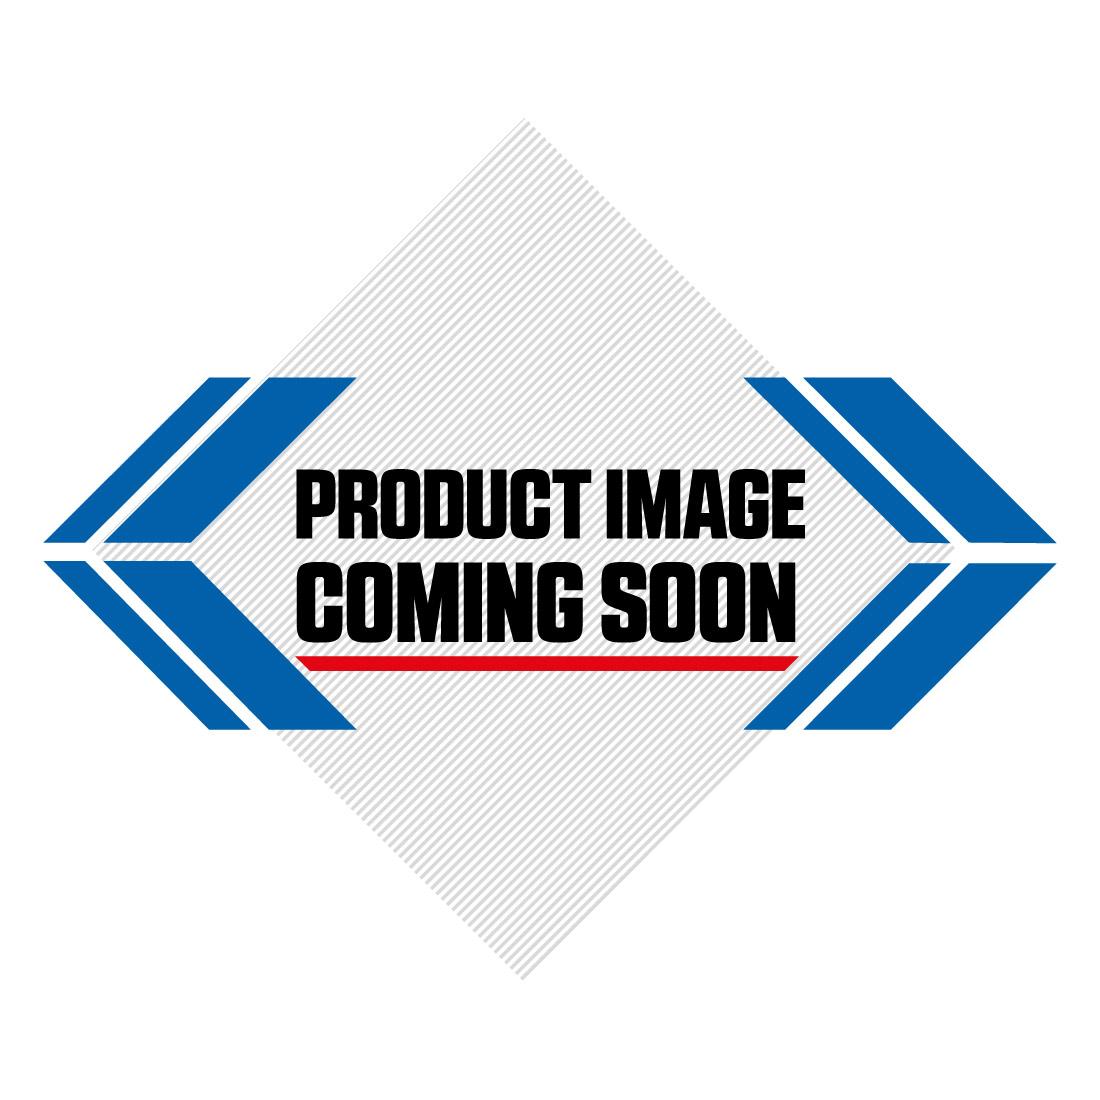 Ufo Yamaha Plastic Kits Md Racing Products